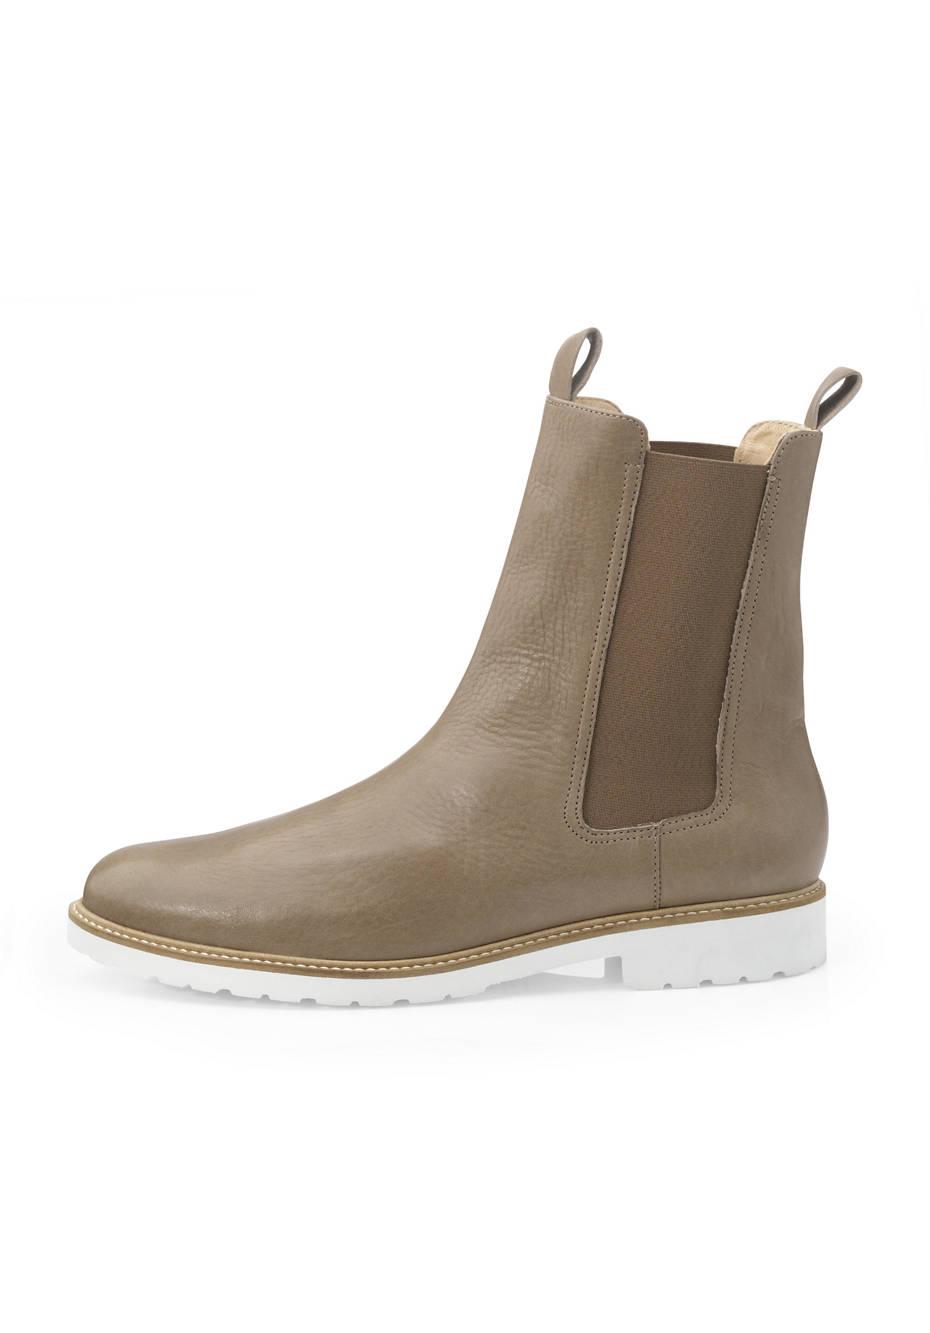 Aus Herren Chelsea Hessnatur Schweiz Leder Boots qMVzSUGp